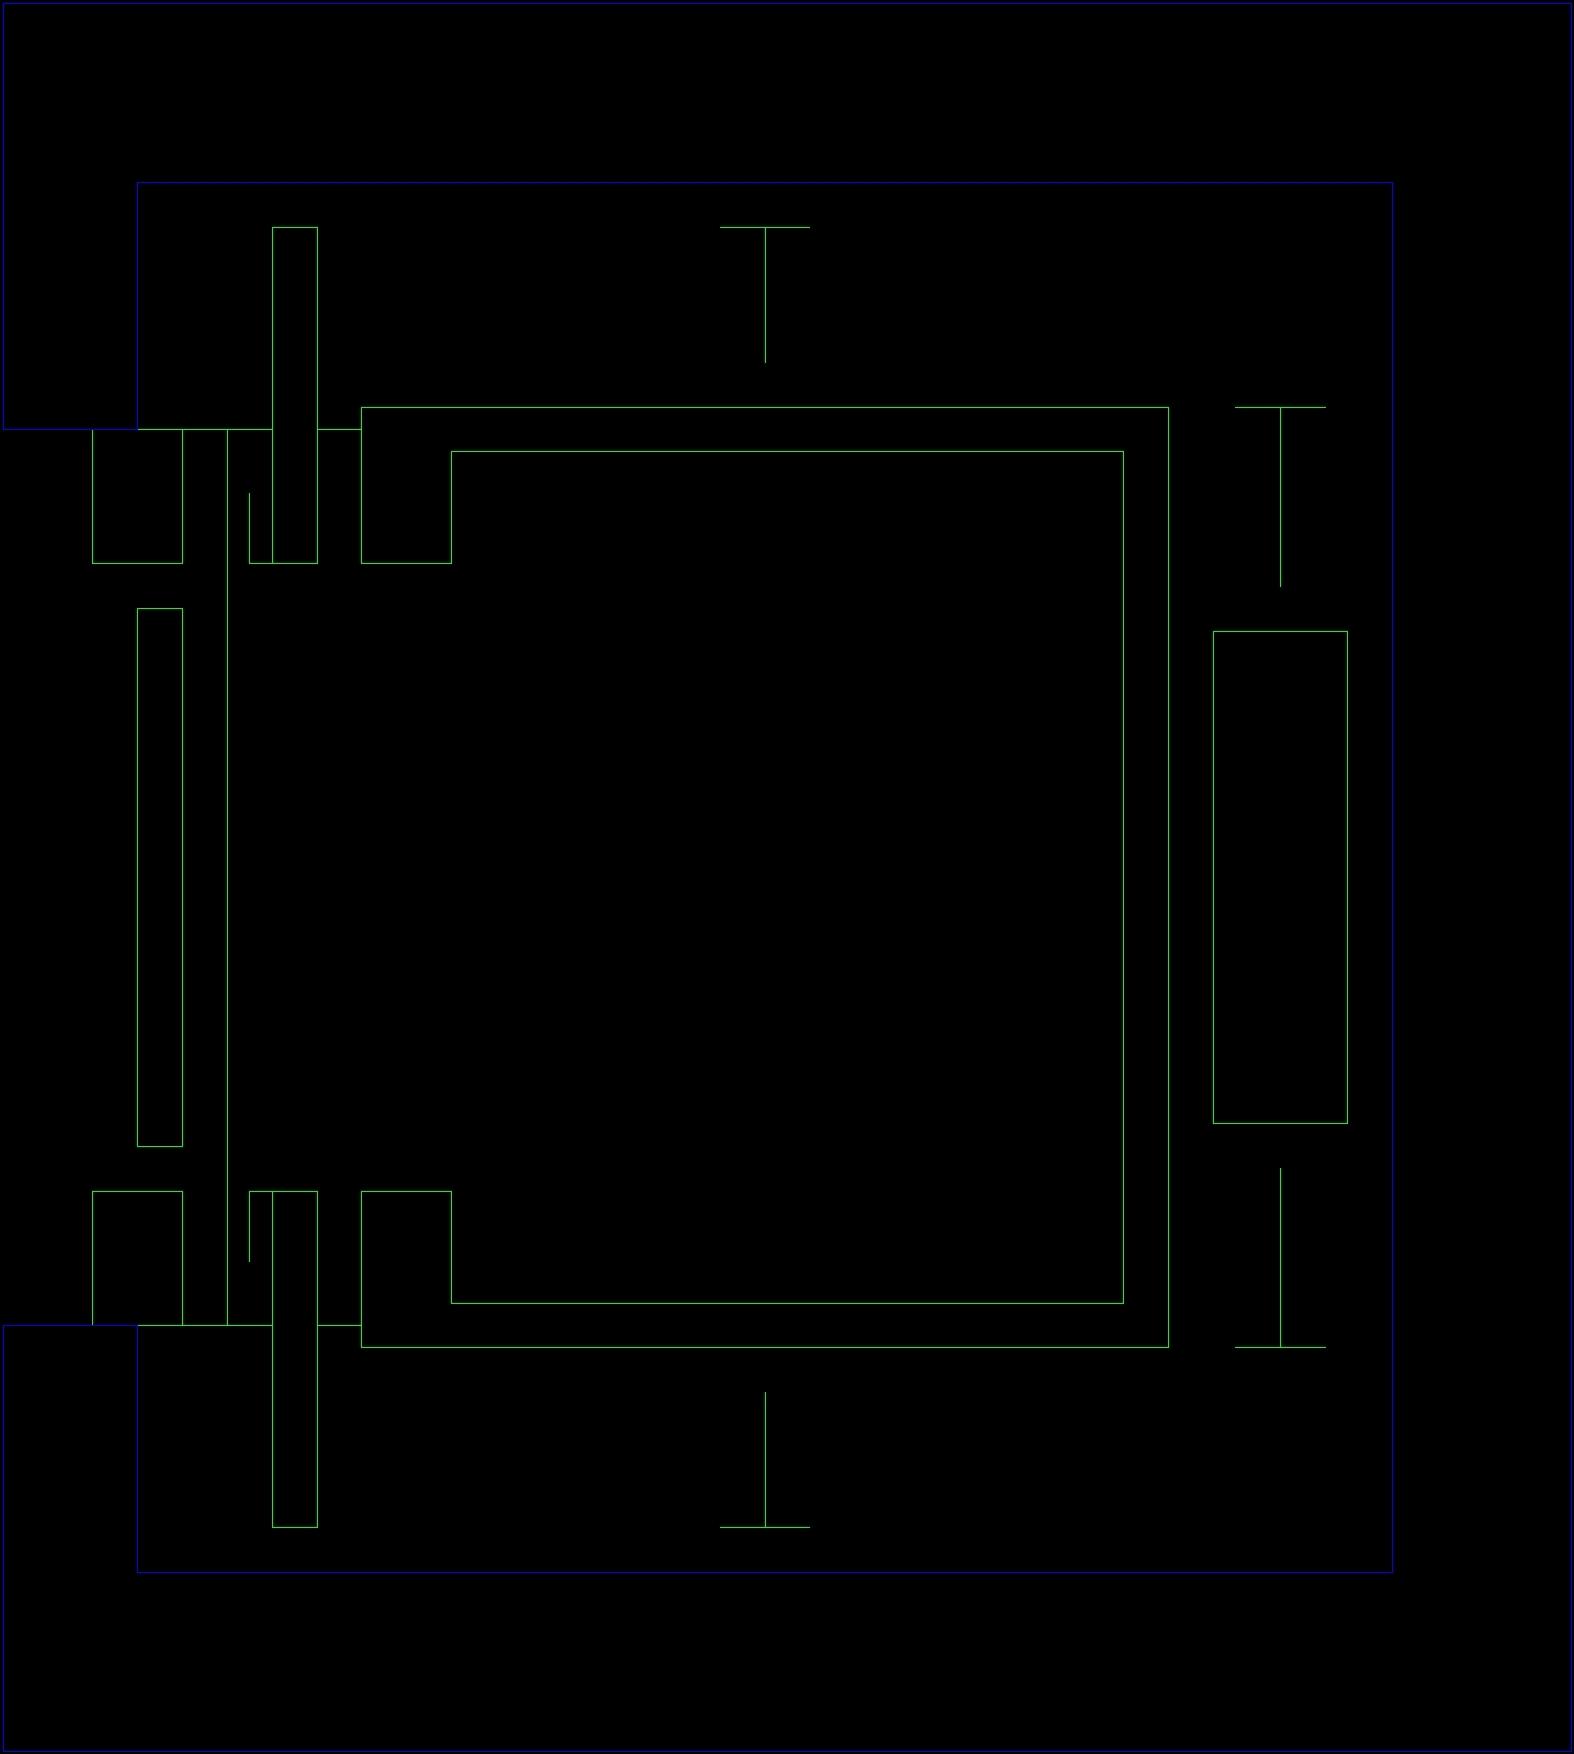 Elevator DWG Block For AutoCAD • Designs CAD